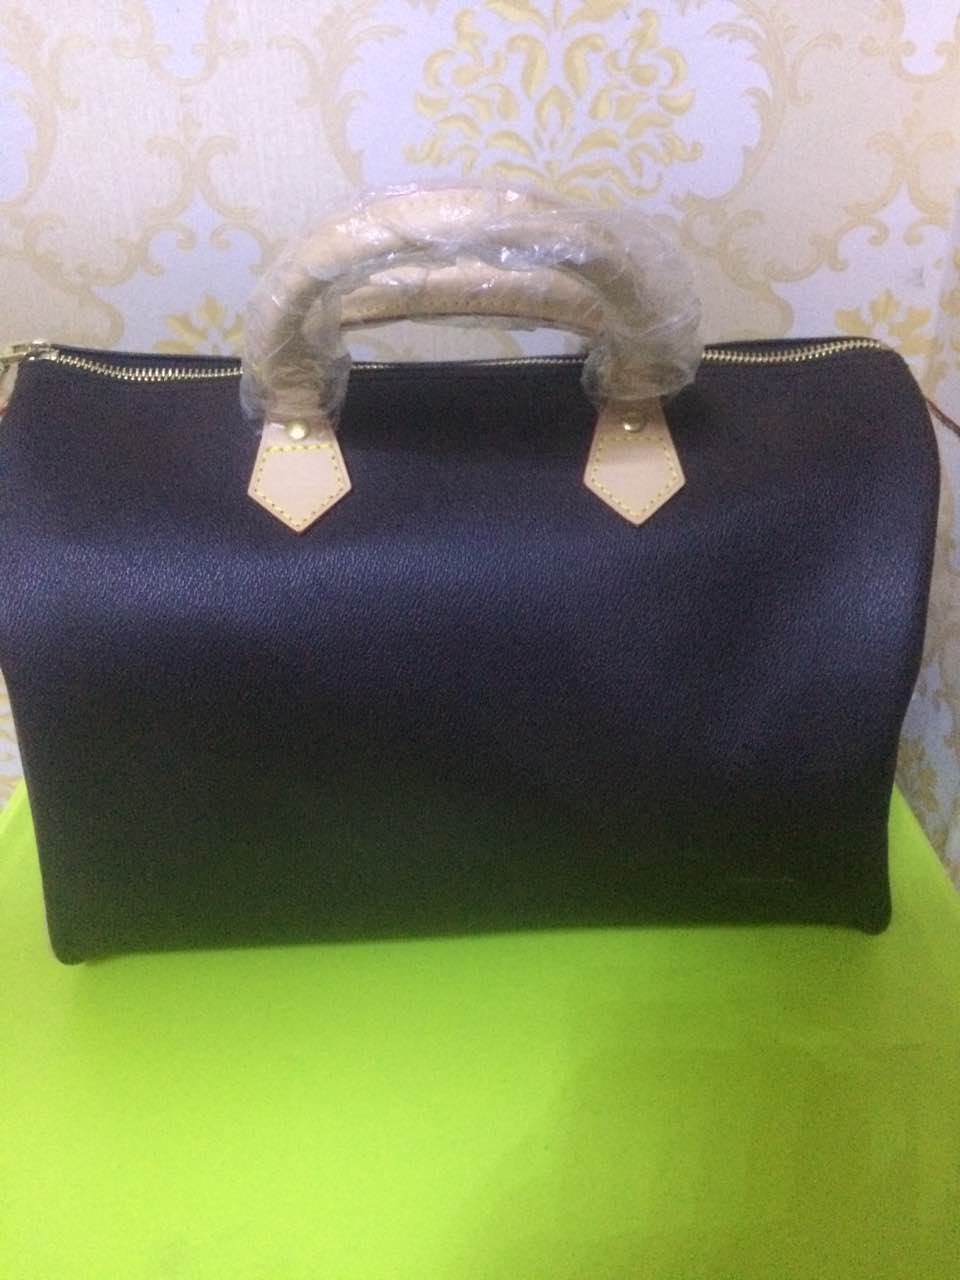 Best selling explosion!!! 2017 new fashion womens handbag Speedy bag 30 / 35cm. Free Delivery<br>